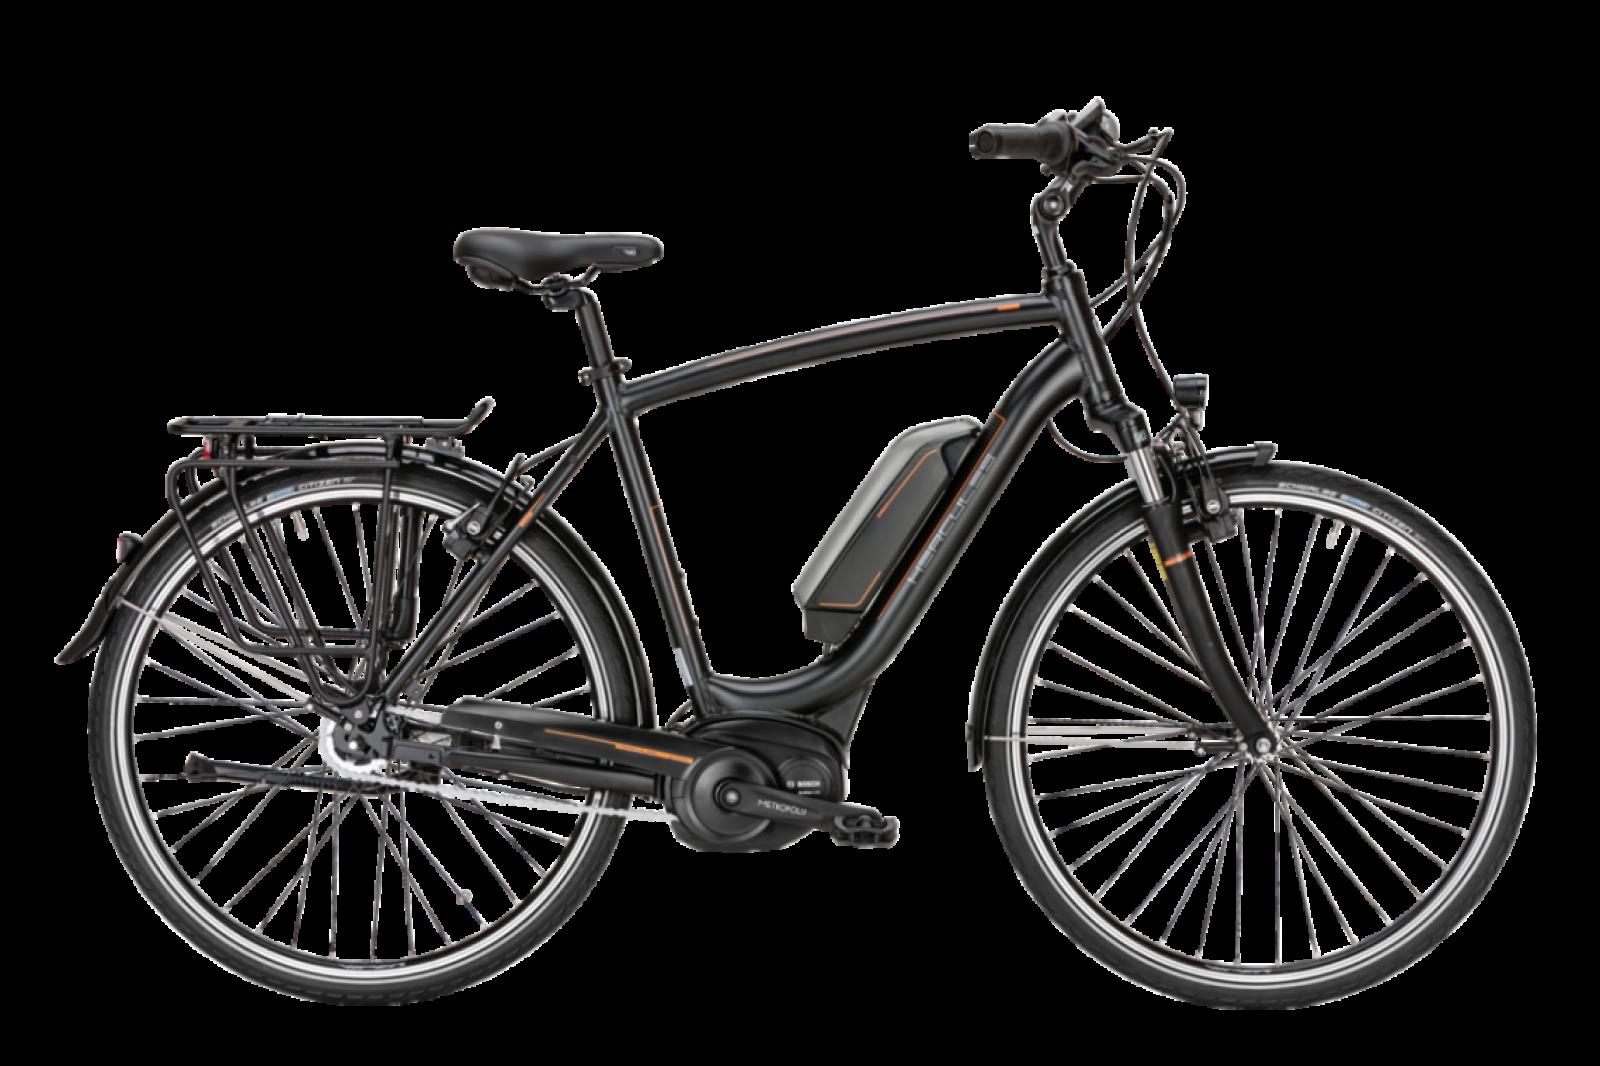 hercules e bike robert f7 diamond 28 inches t fitness. Black Bedroom Furniture Sets. Home Design Ideas